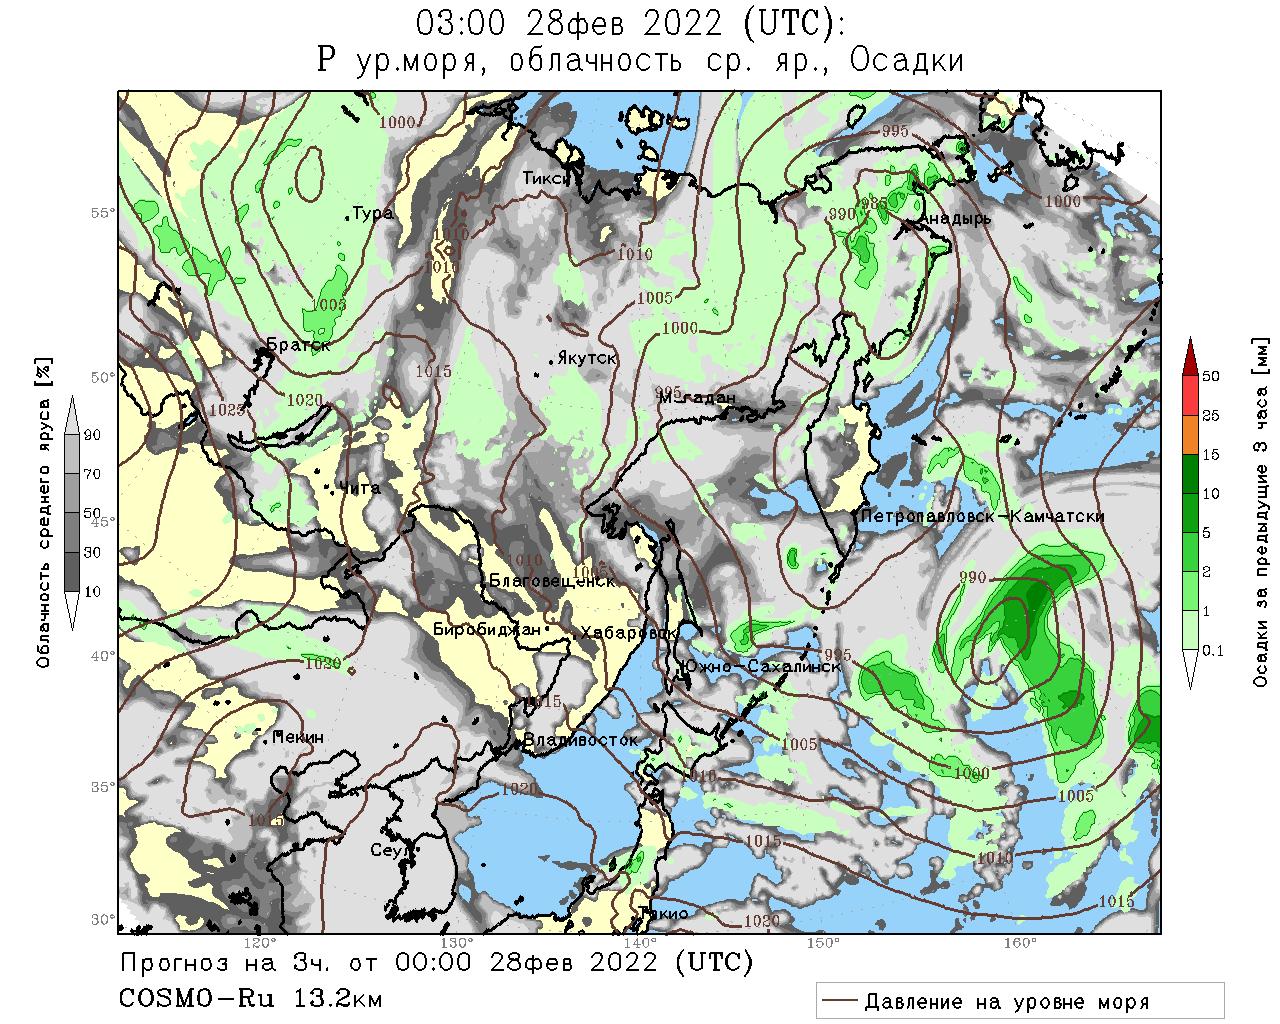 Карты прогнозов модели COSMO